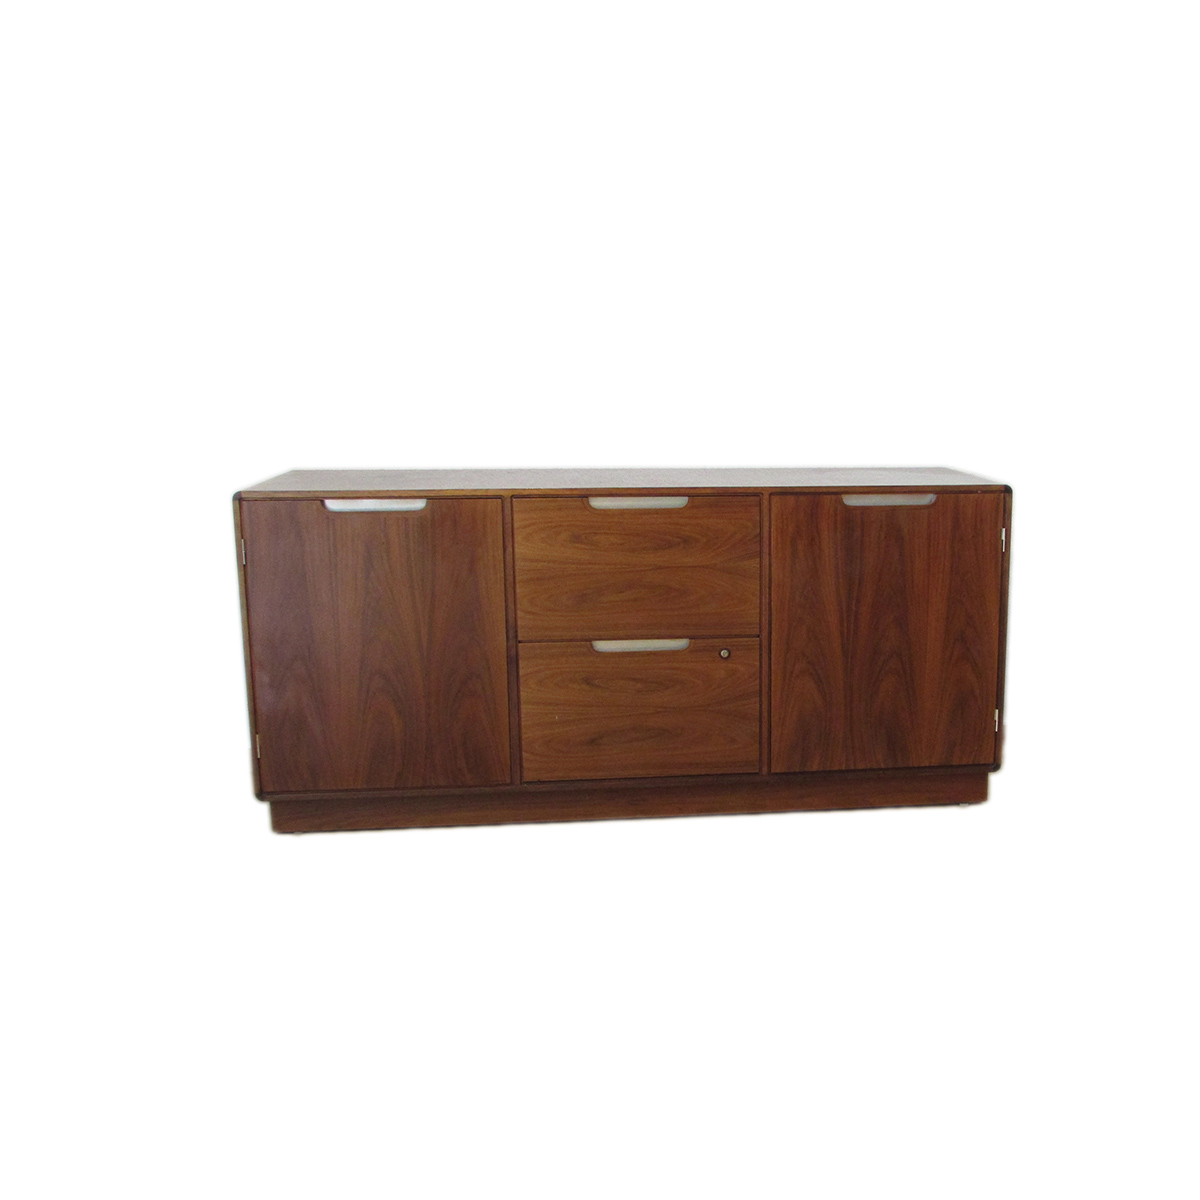 sideboard-sibast-mahogany-vintage